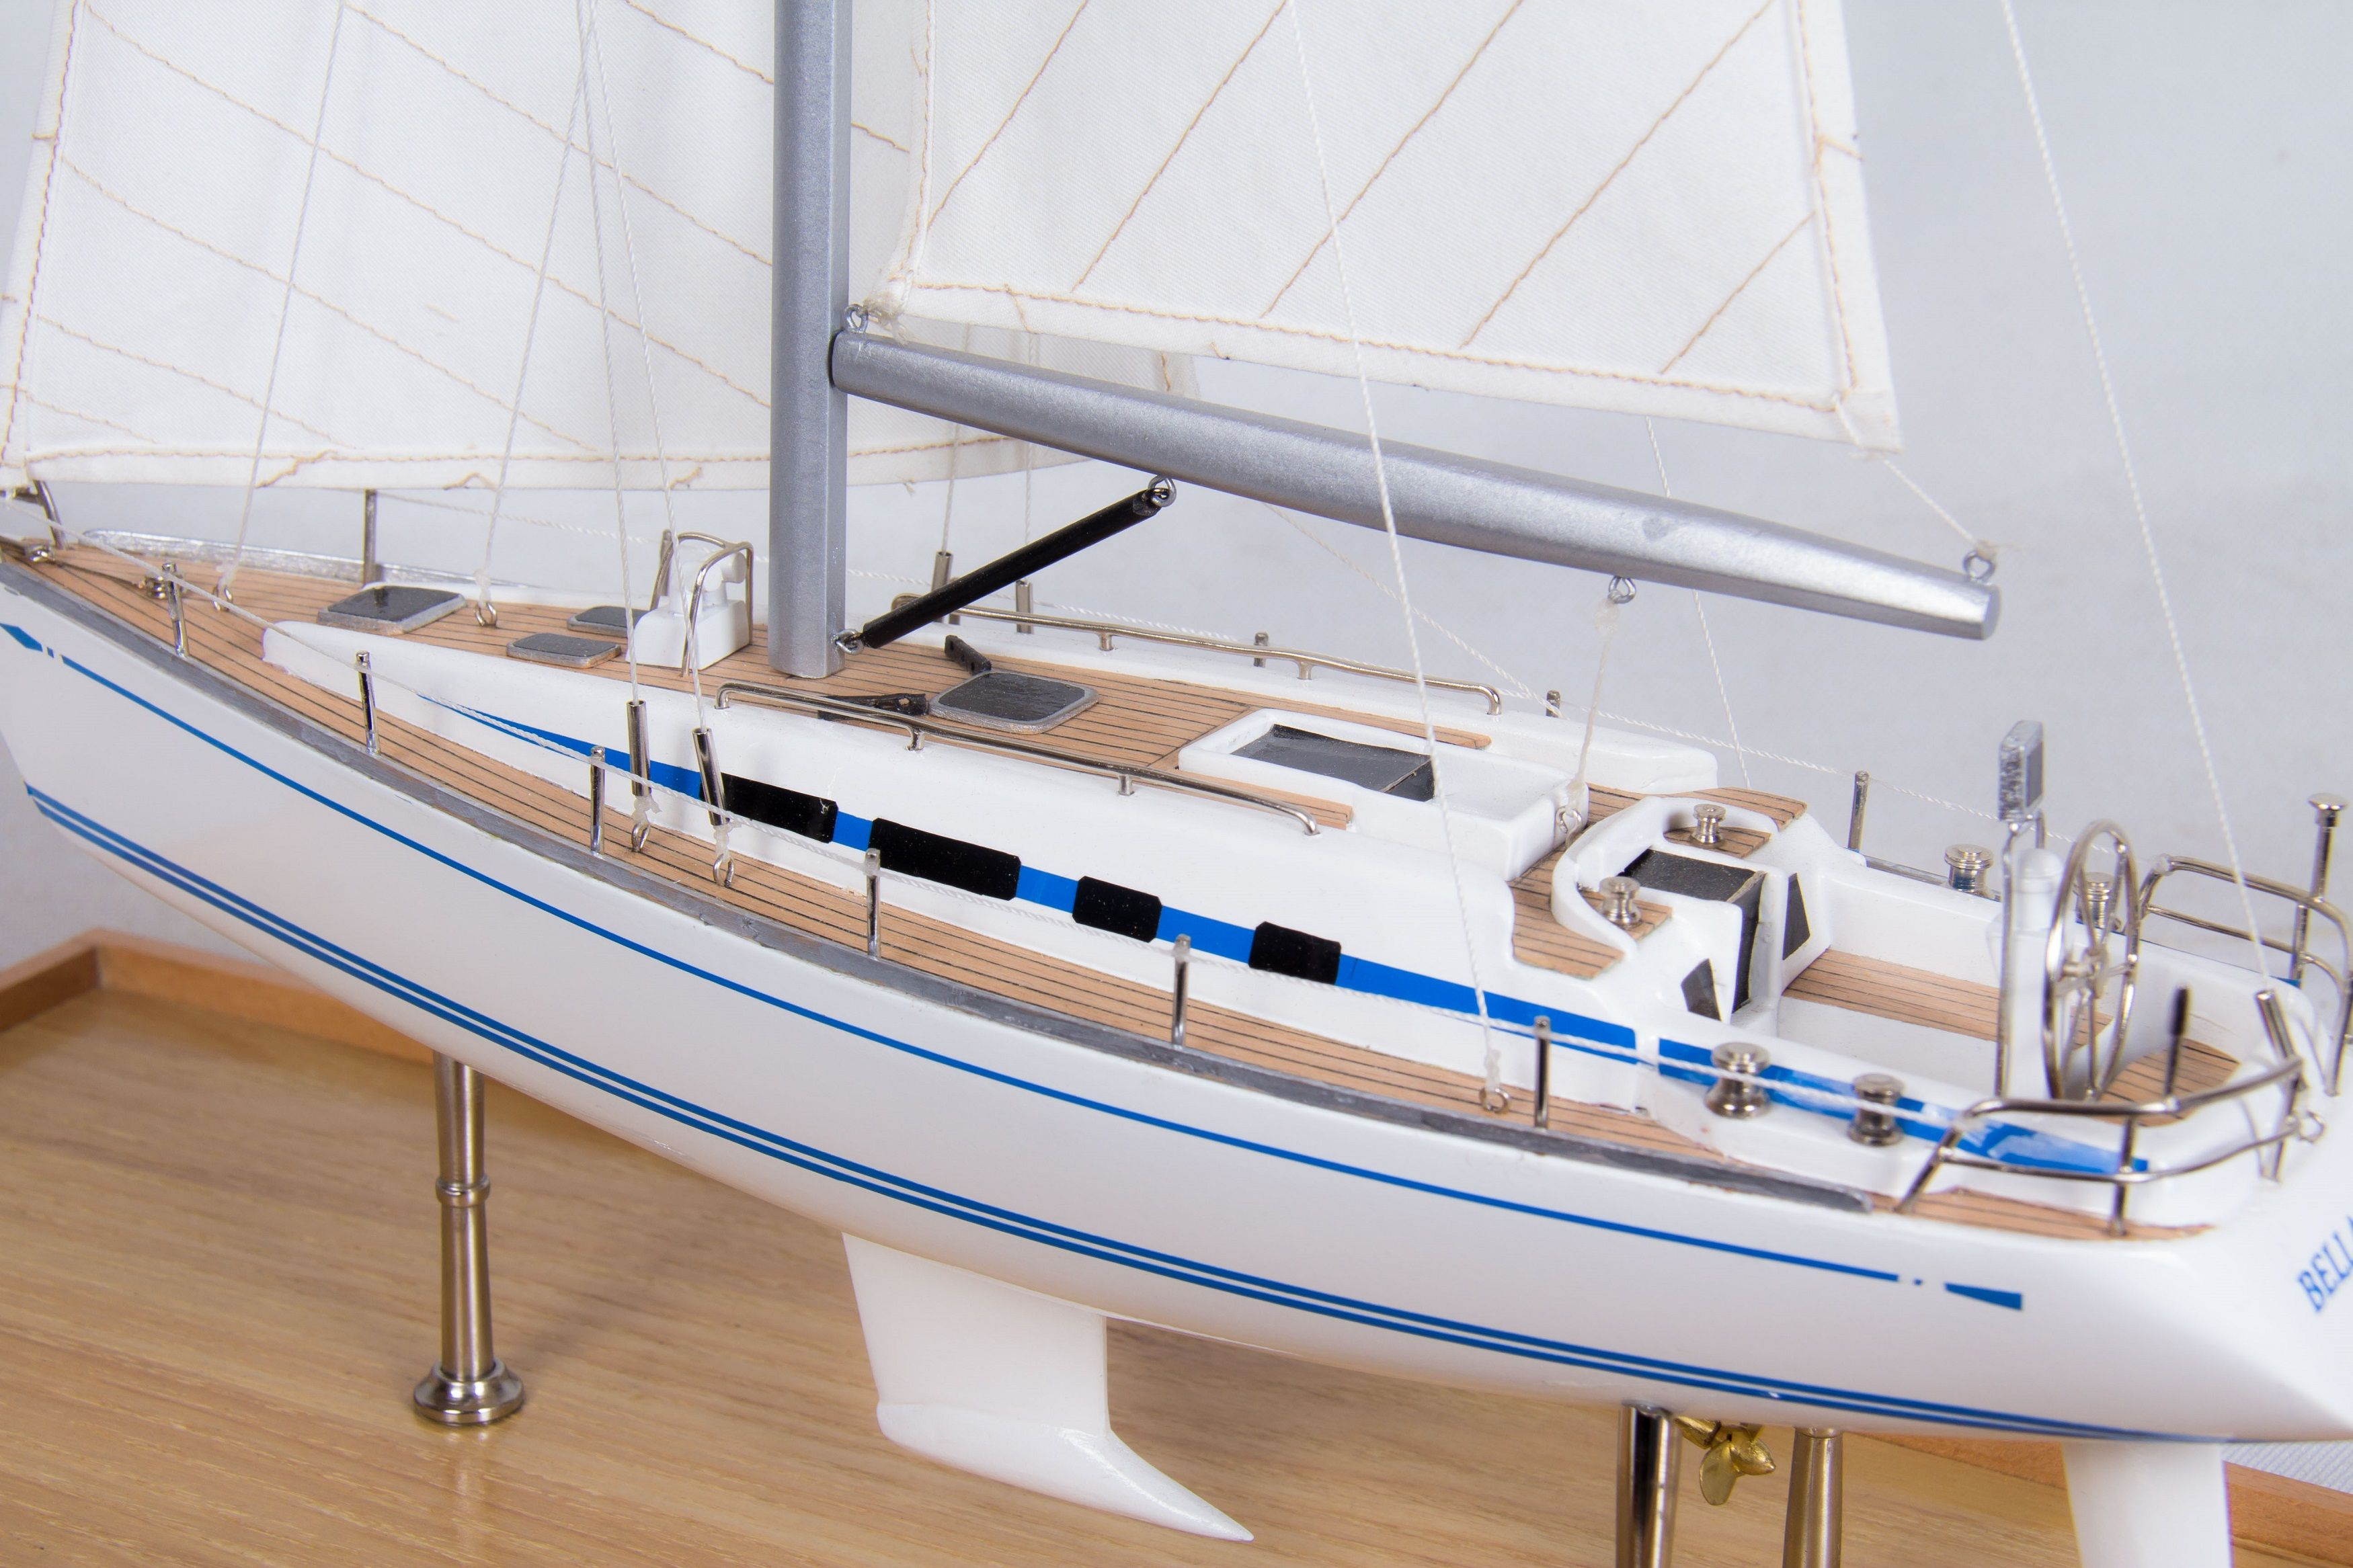 1775-9944-Bella-Nove-Sailing-Yacht-model